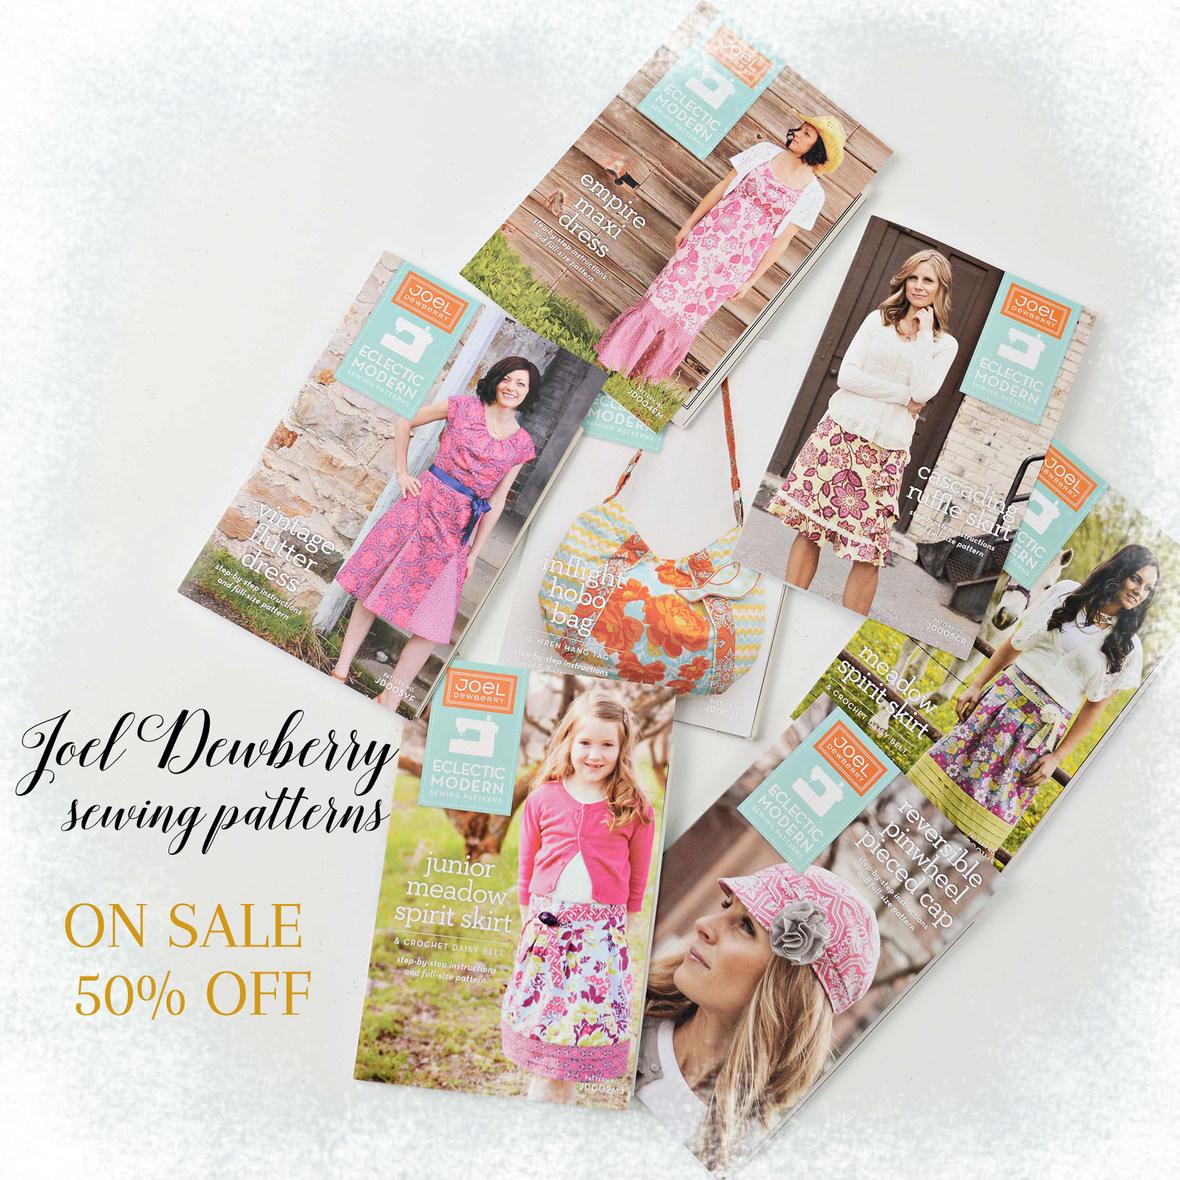 Joel Dewberry Patterns On Sale with frosty border 6x6